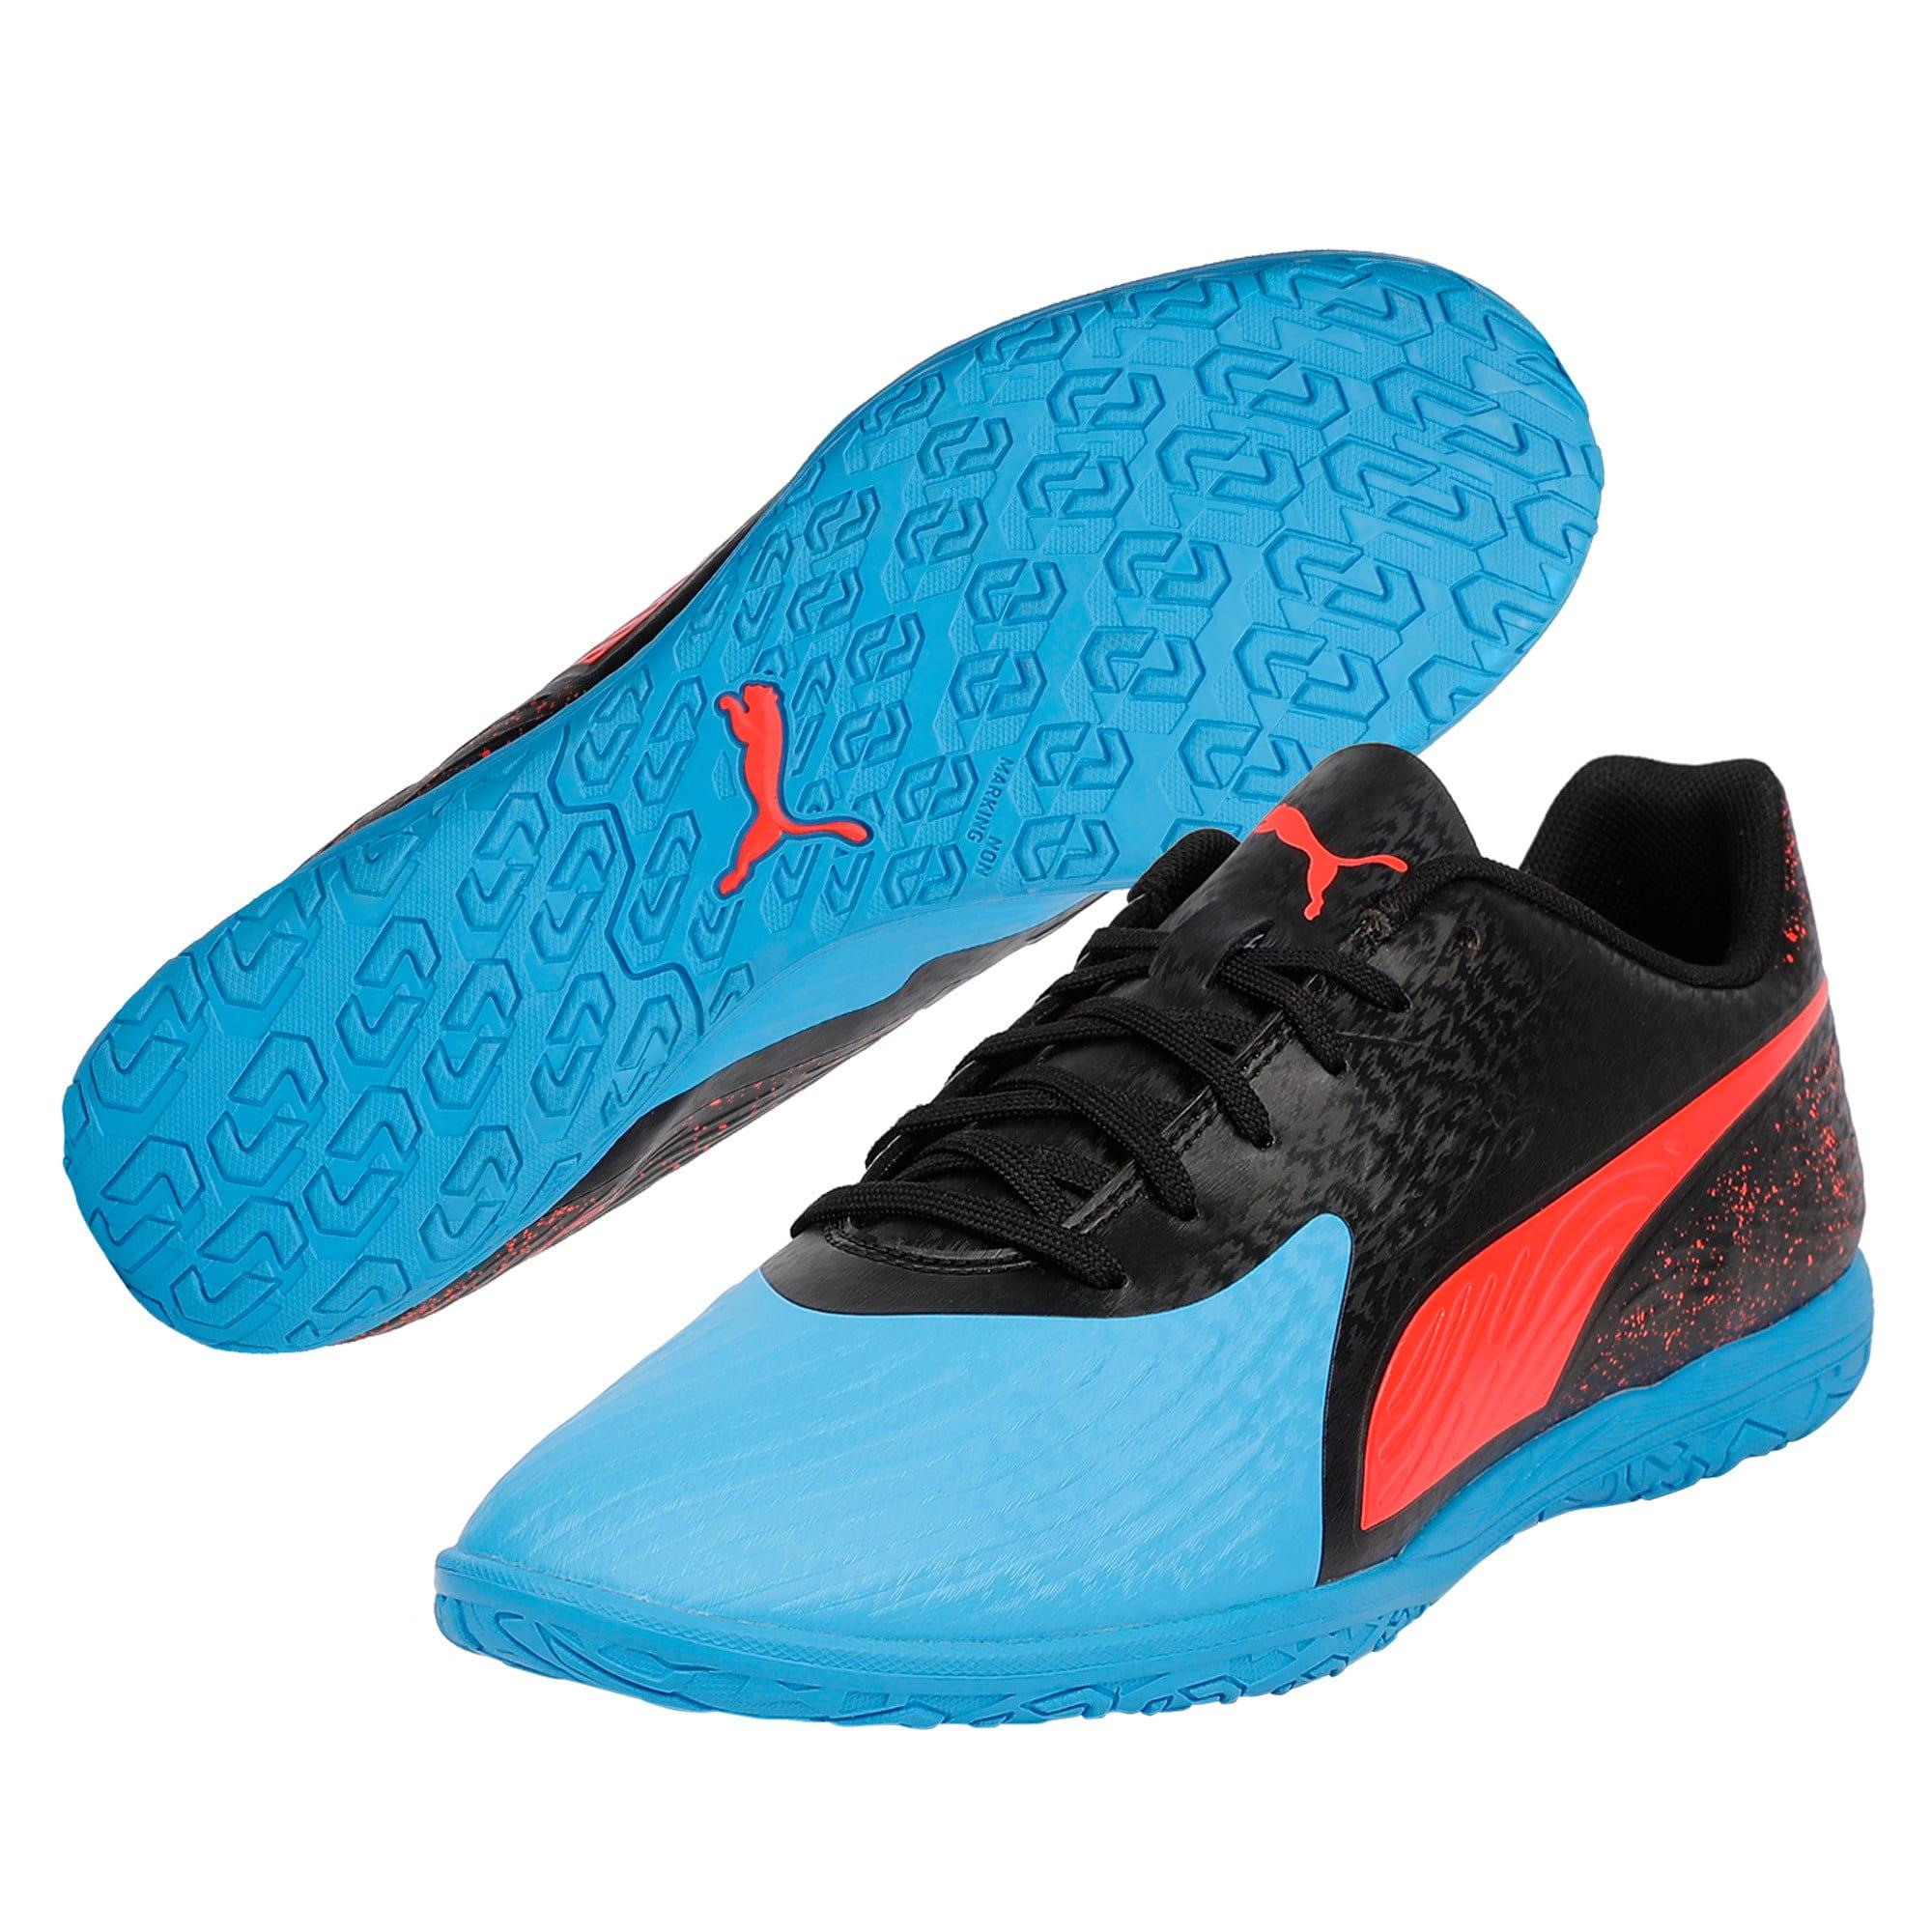 Thumbnail 8 of PUMA ONE 19.4 IT Men's Football Boots, Bleu Azur-Red Blast-Black, medium-IND